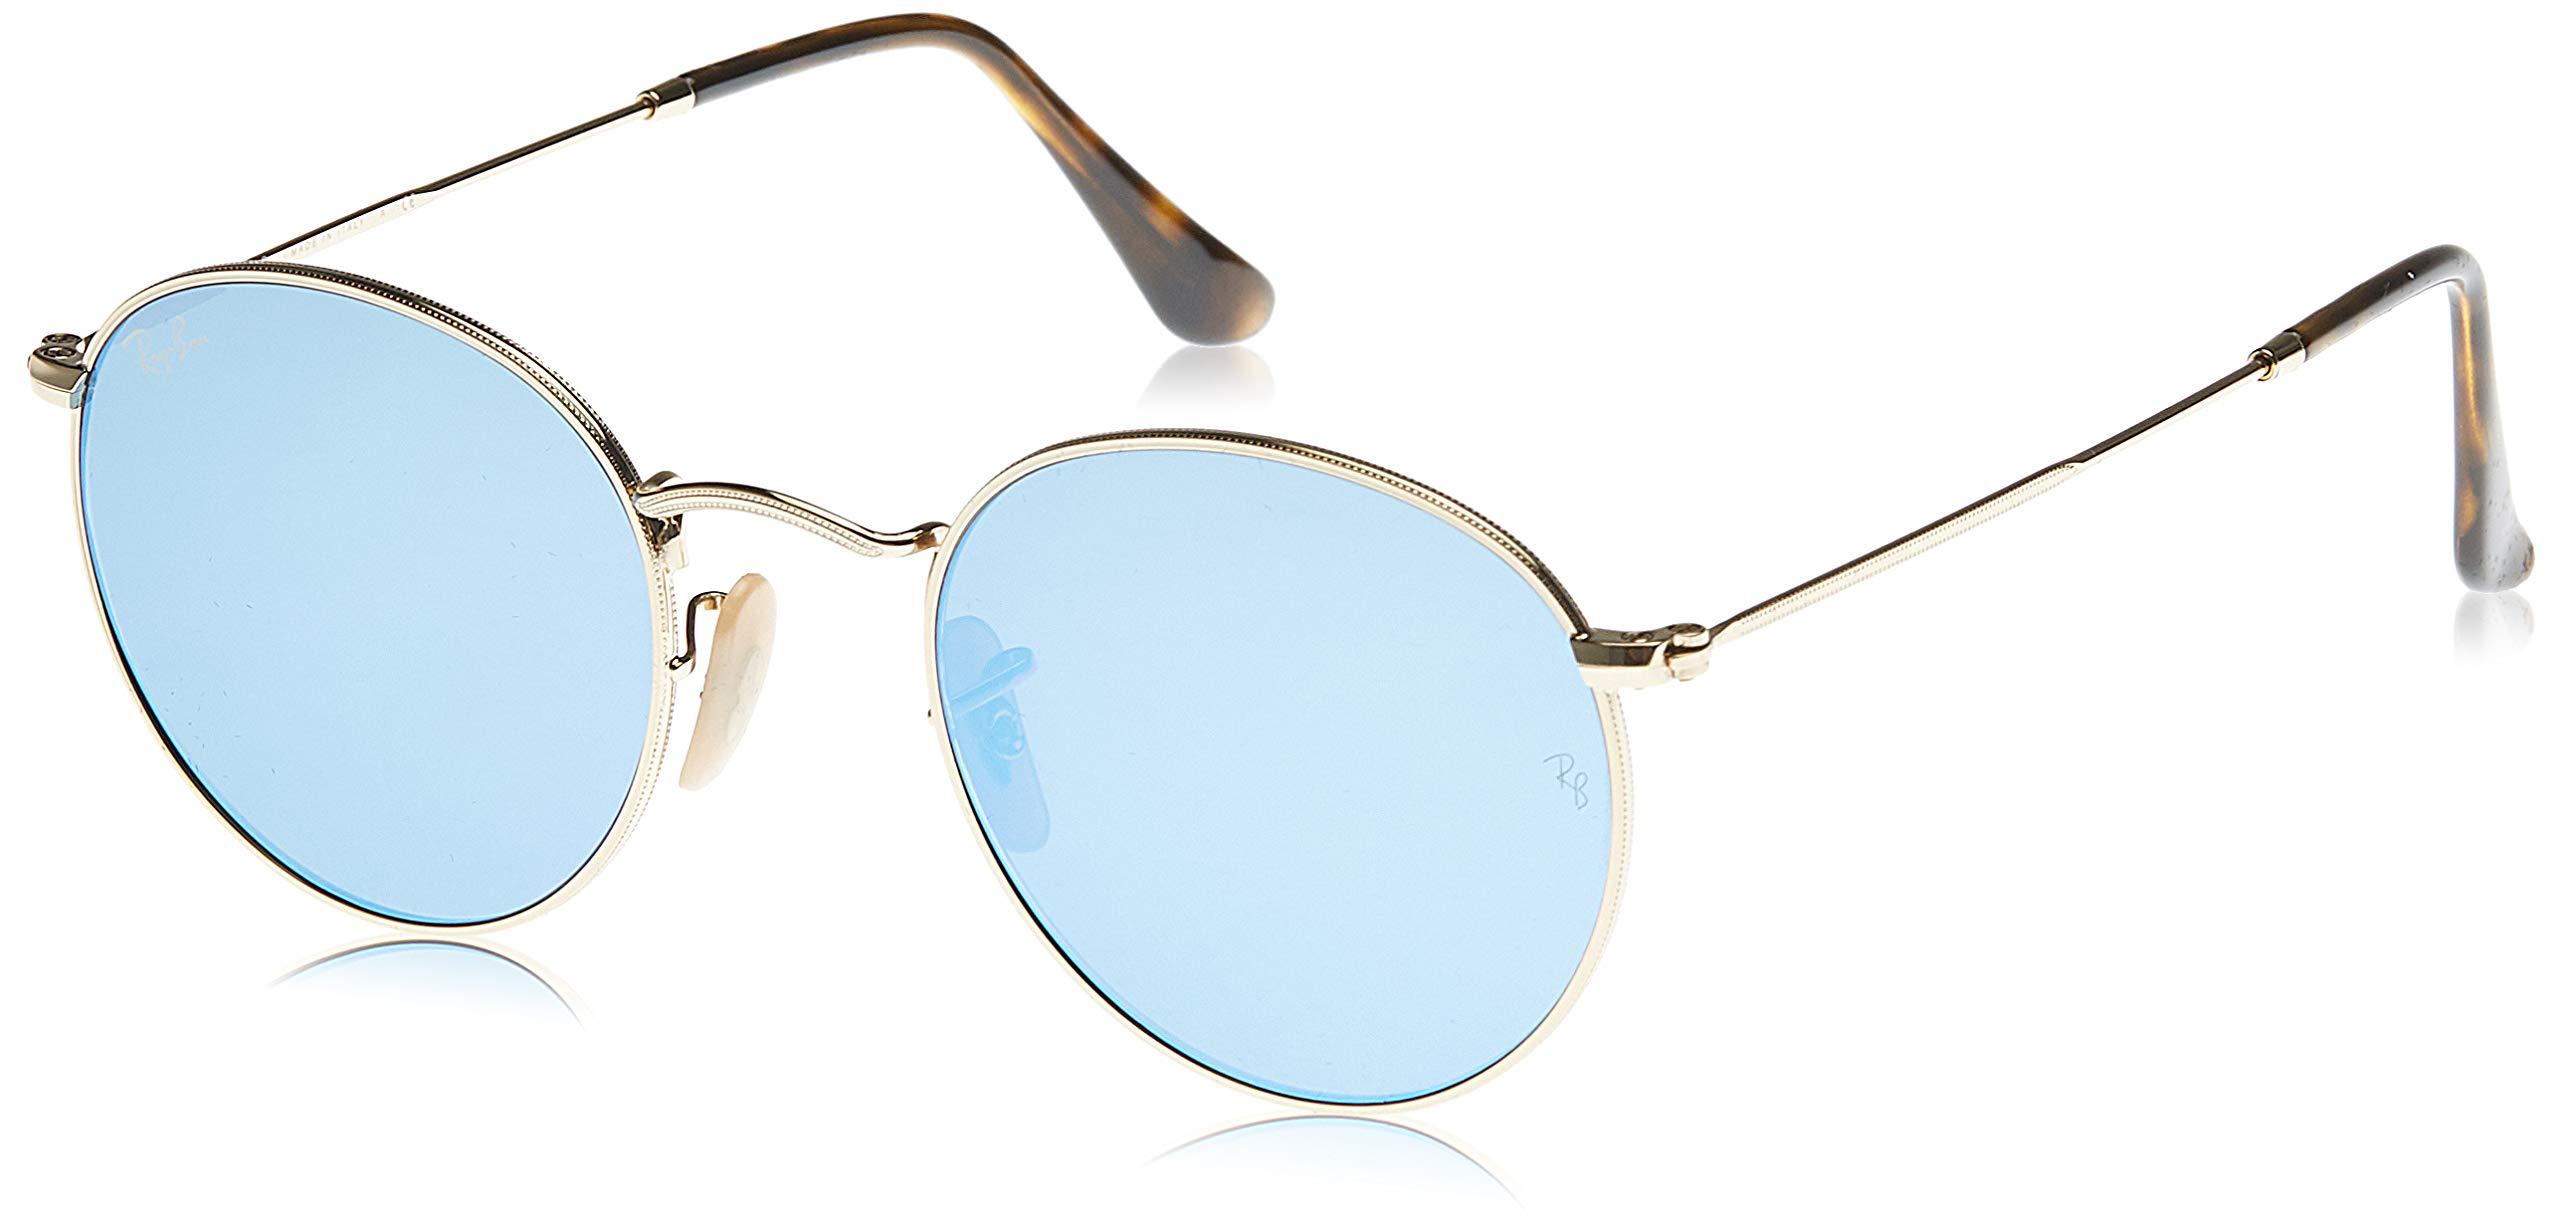 Ray-Ban Rb3447n Round Flat Lenses Metal Sunglasses